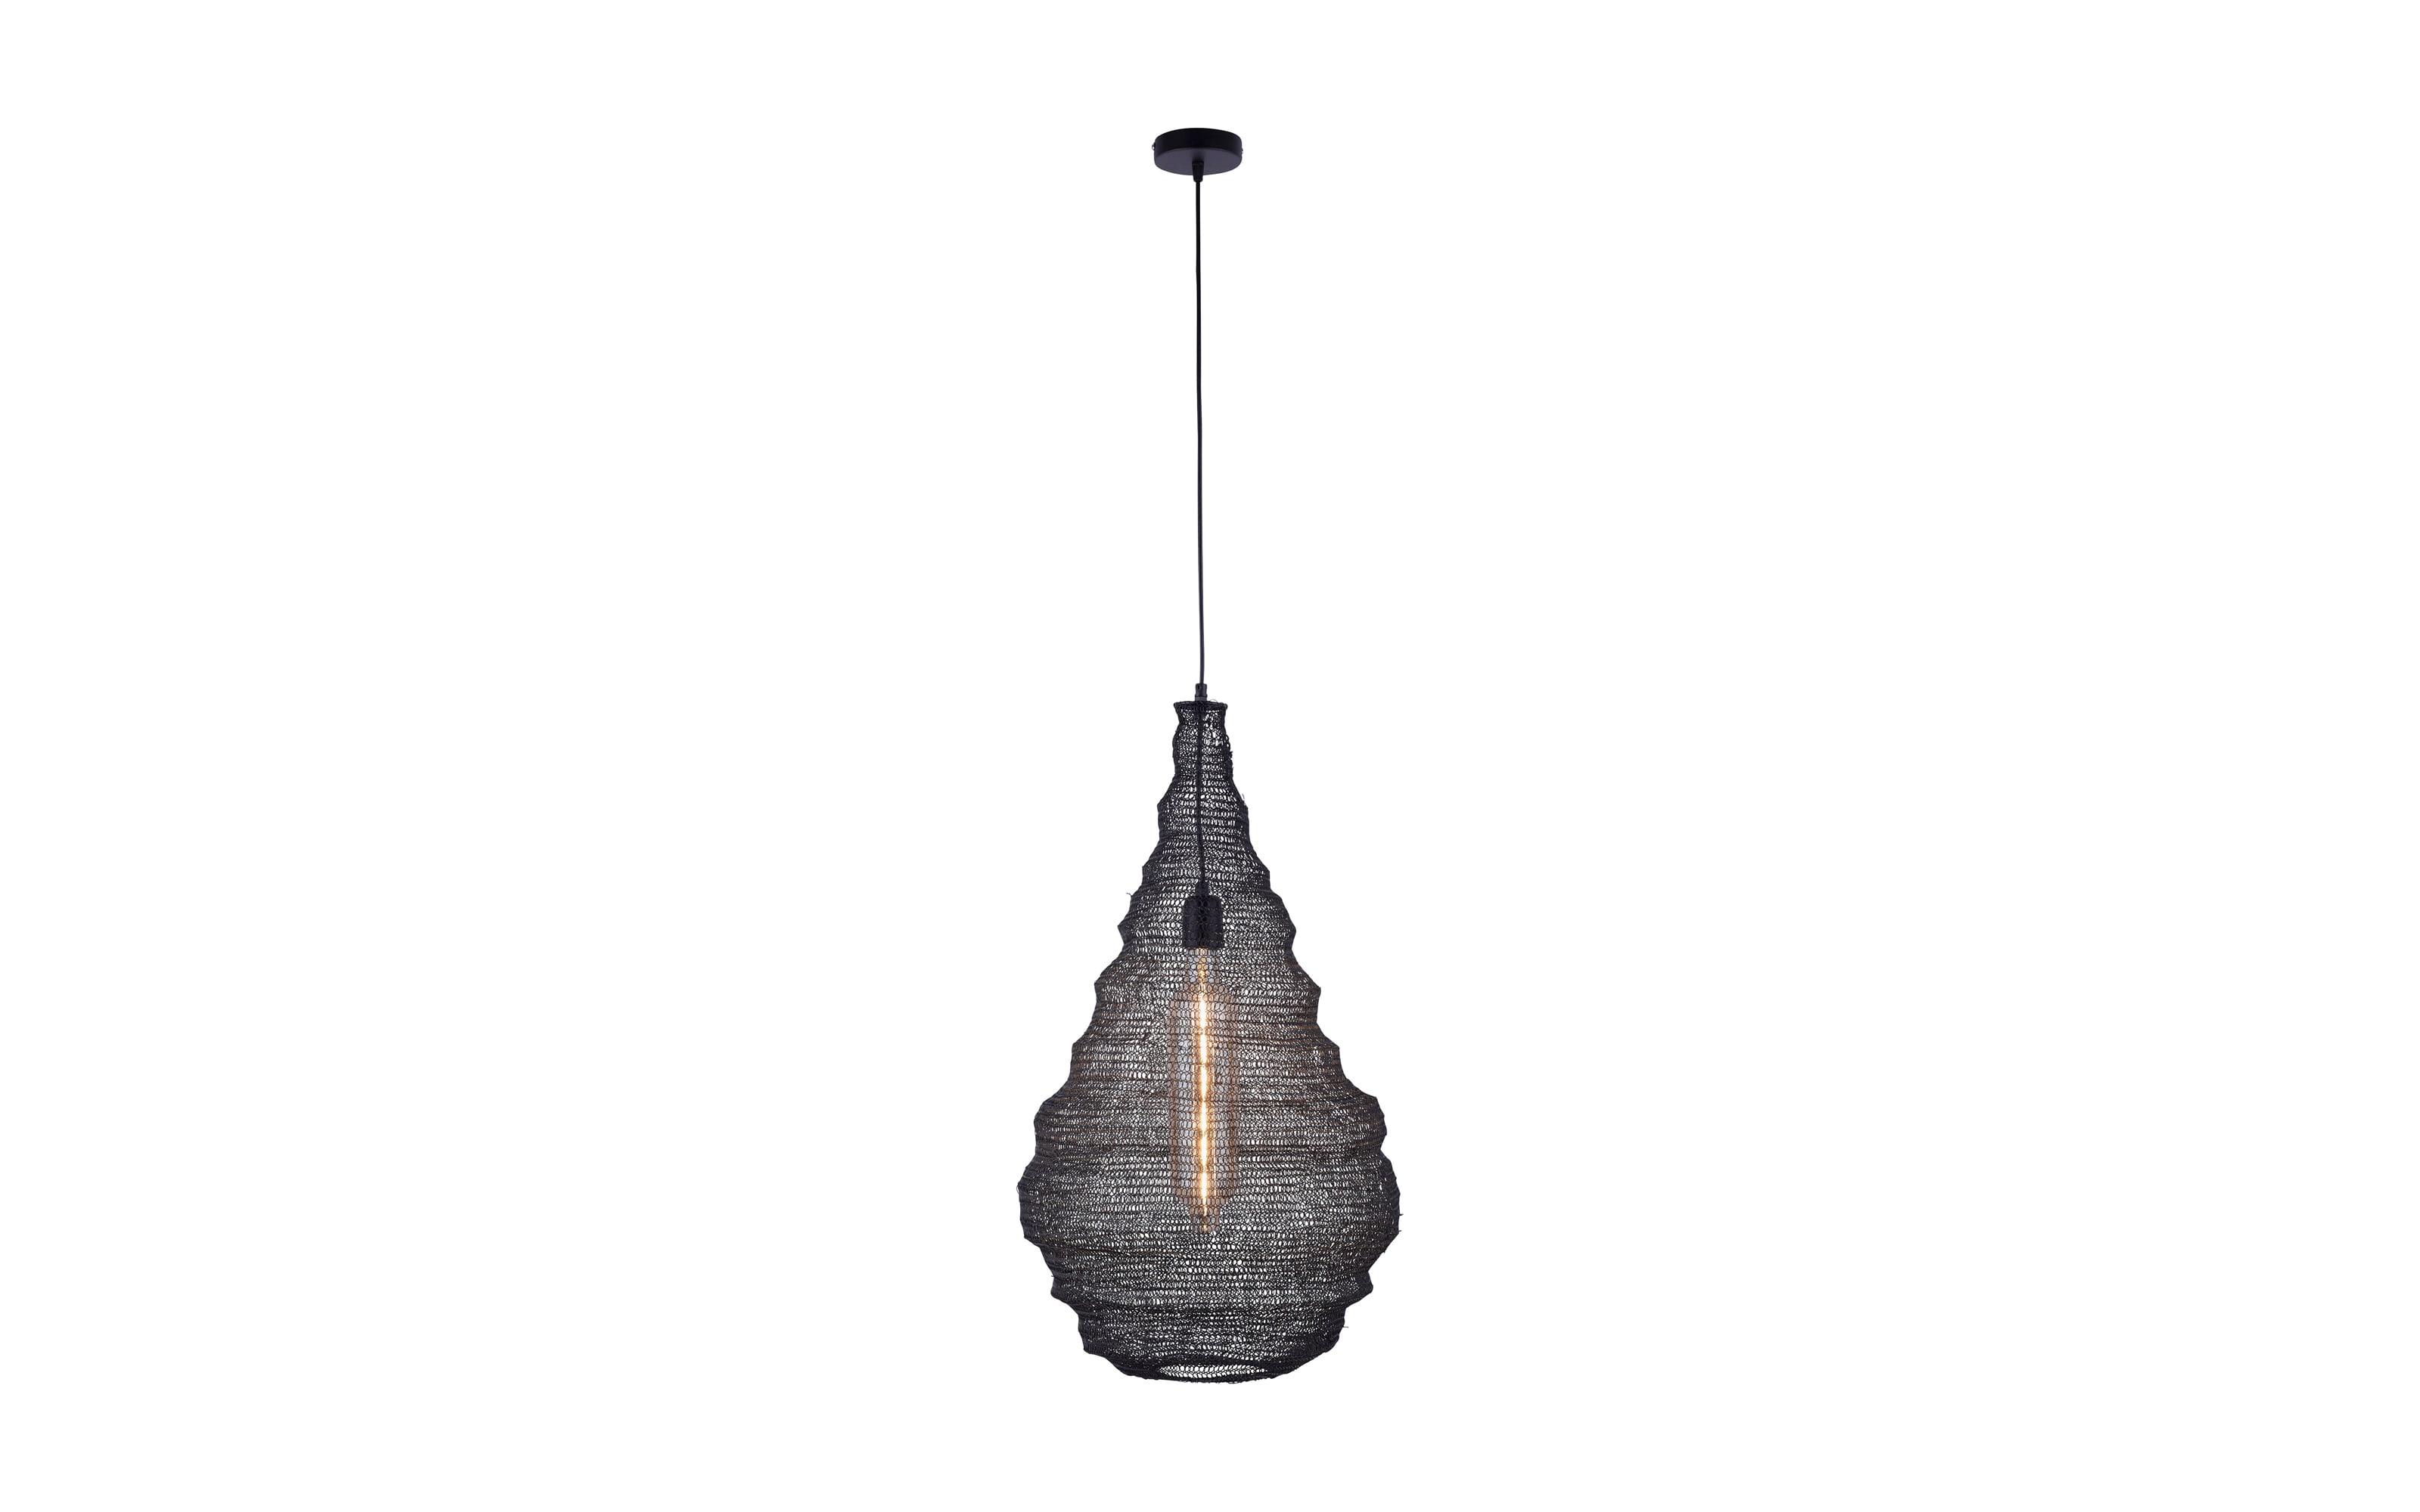 Pendelleuchte Kokon in schwarz, 41 cm